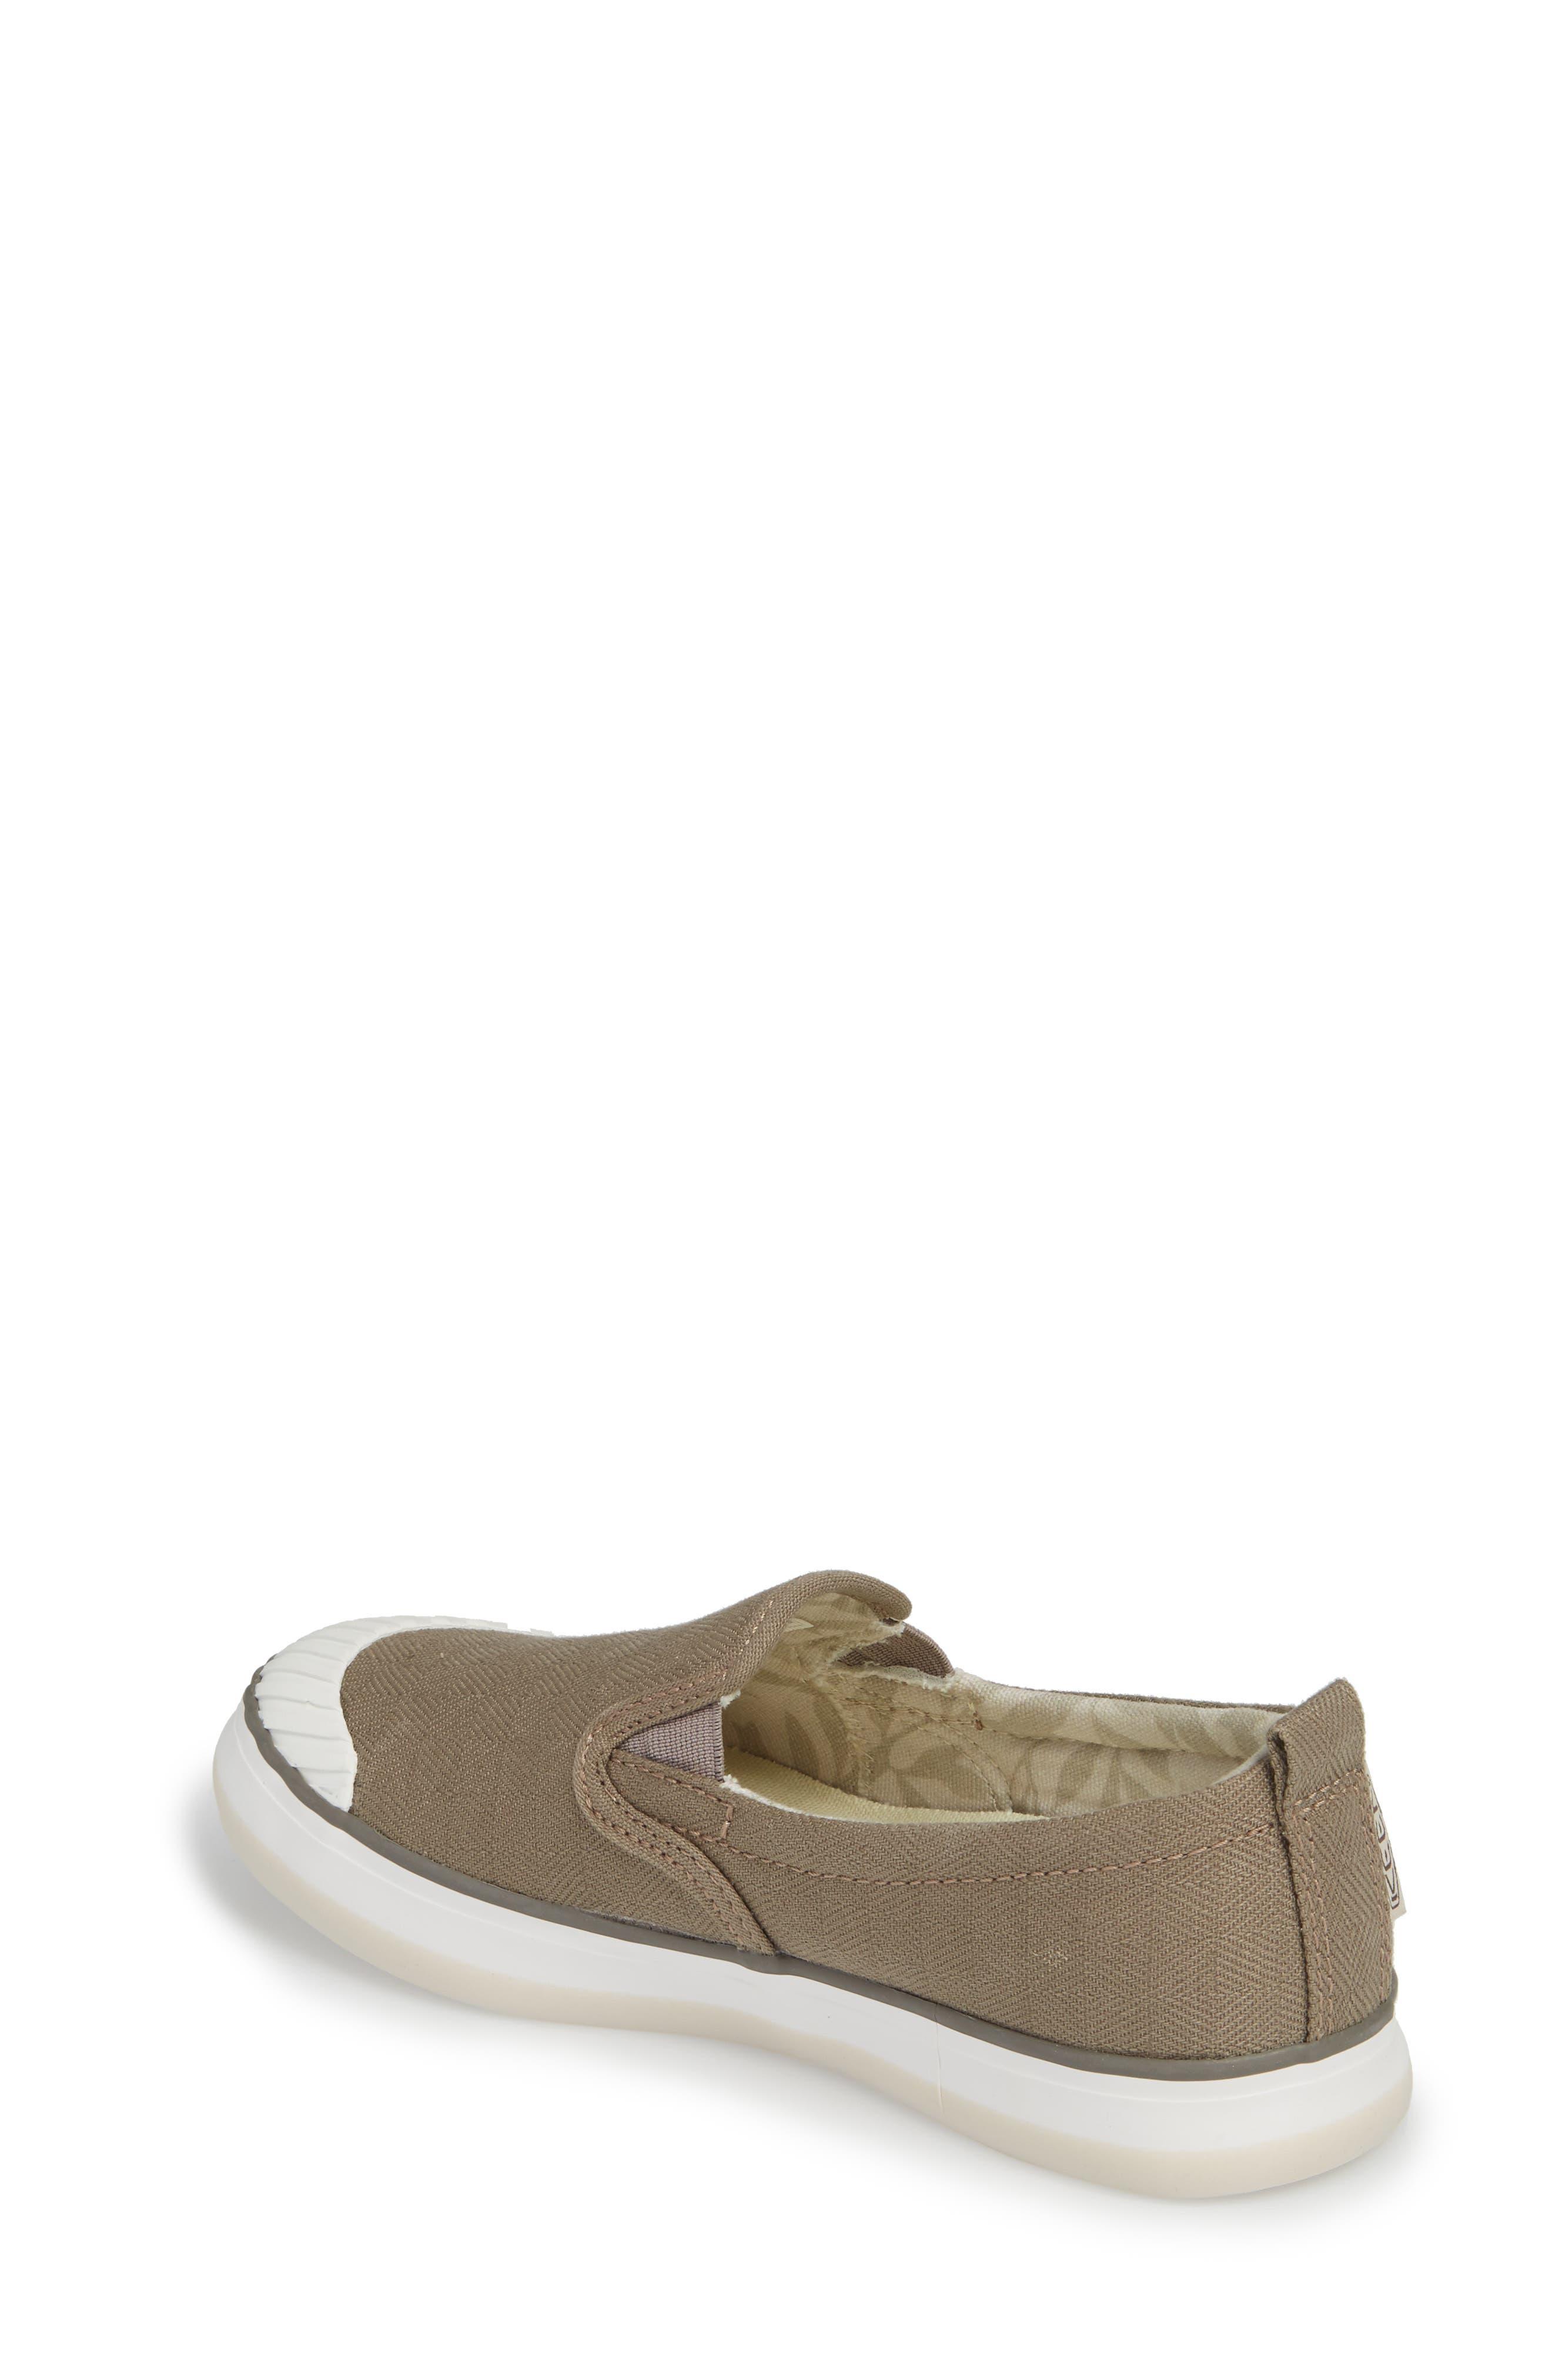 Elsa Slip-On Sneaker,                             Alternate thumbnail 2, color,                             Brindle